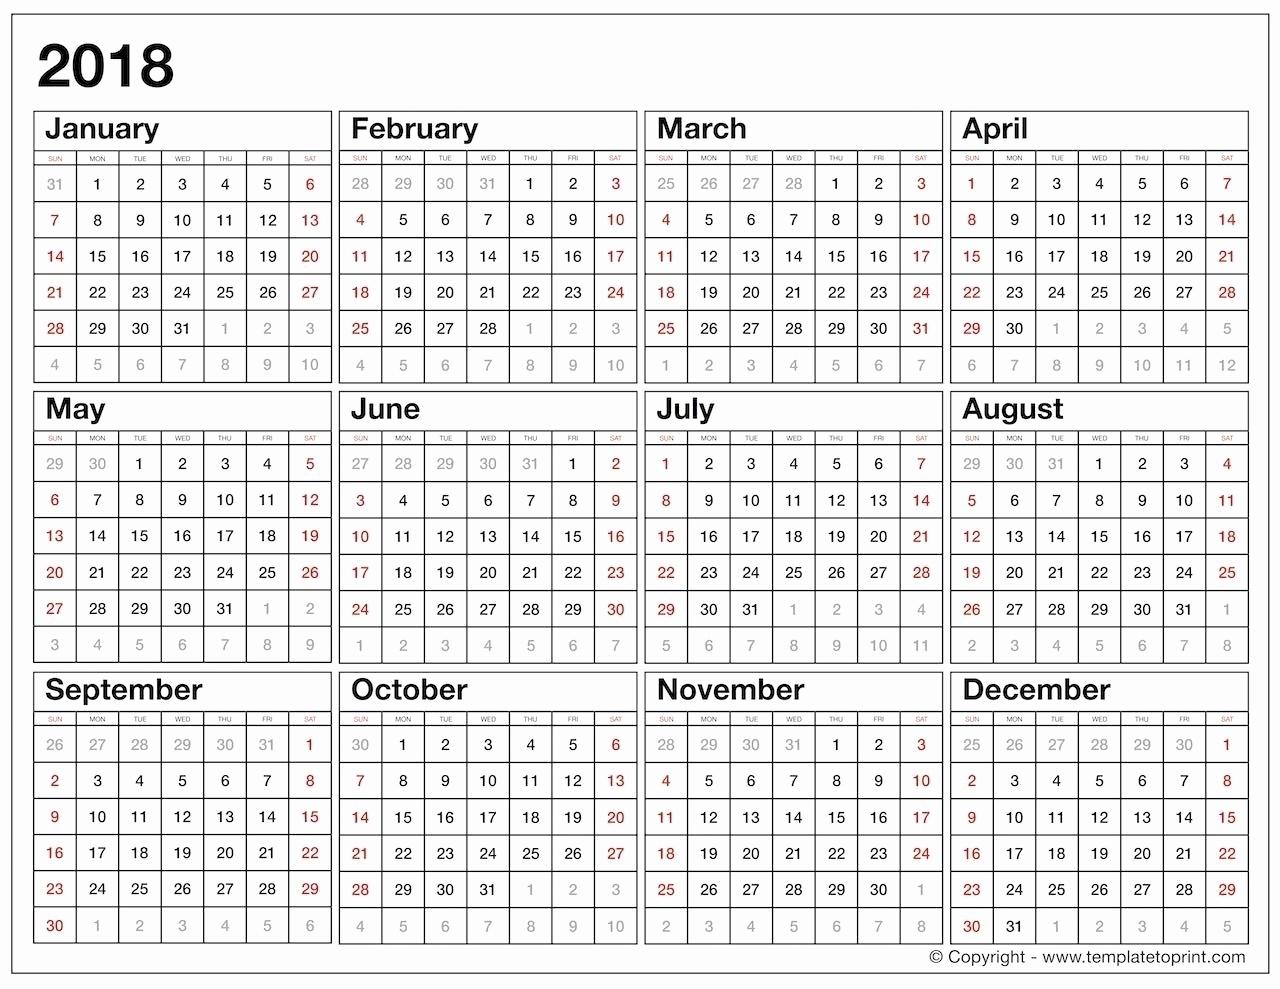 Calendar Template Year At A Glance  Calendar Inspiration regarding Blank Year At A Glance Calendar